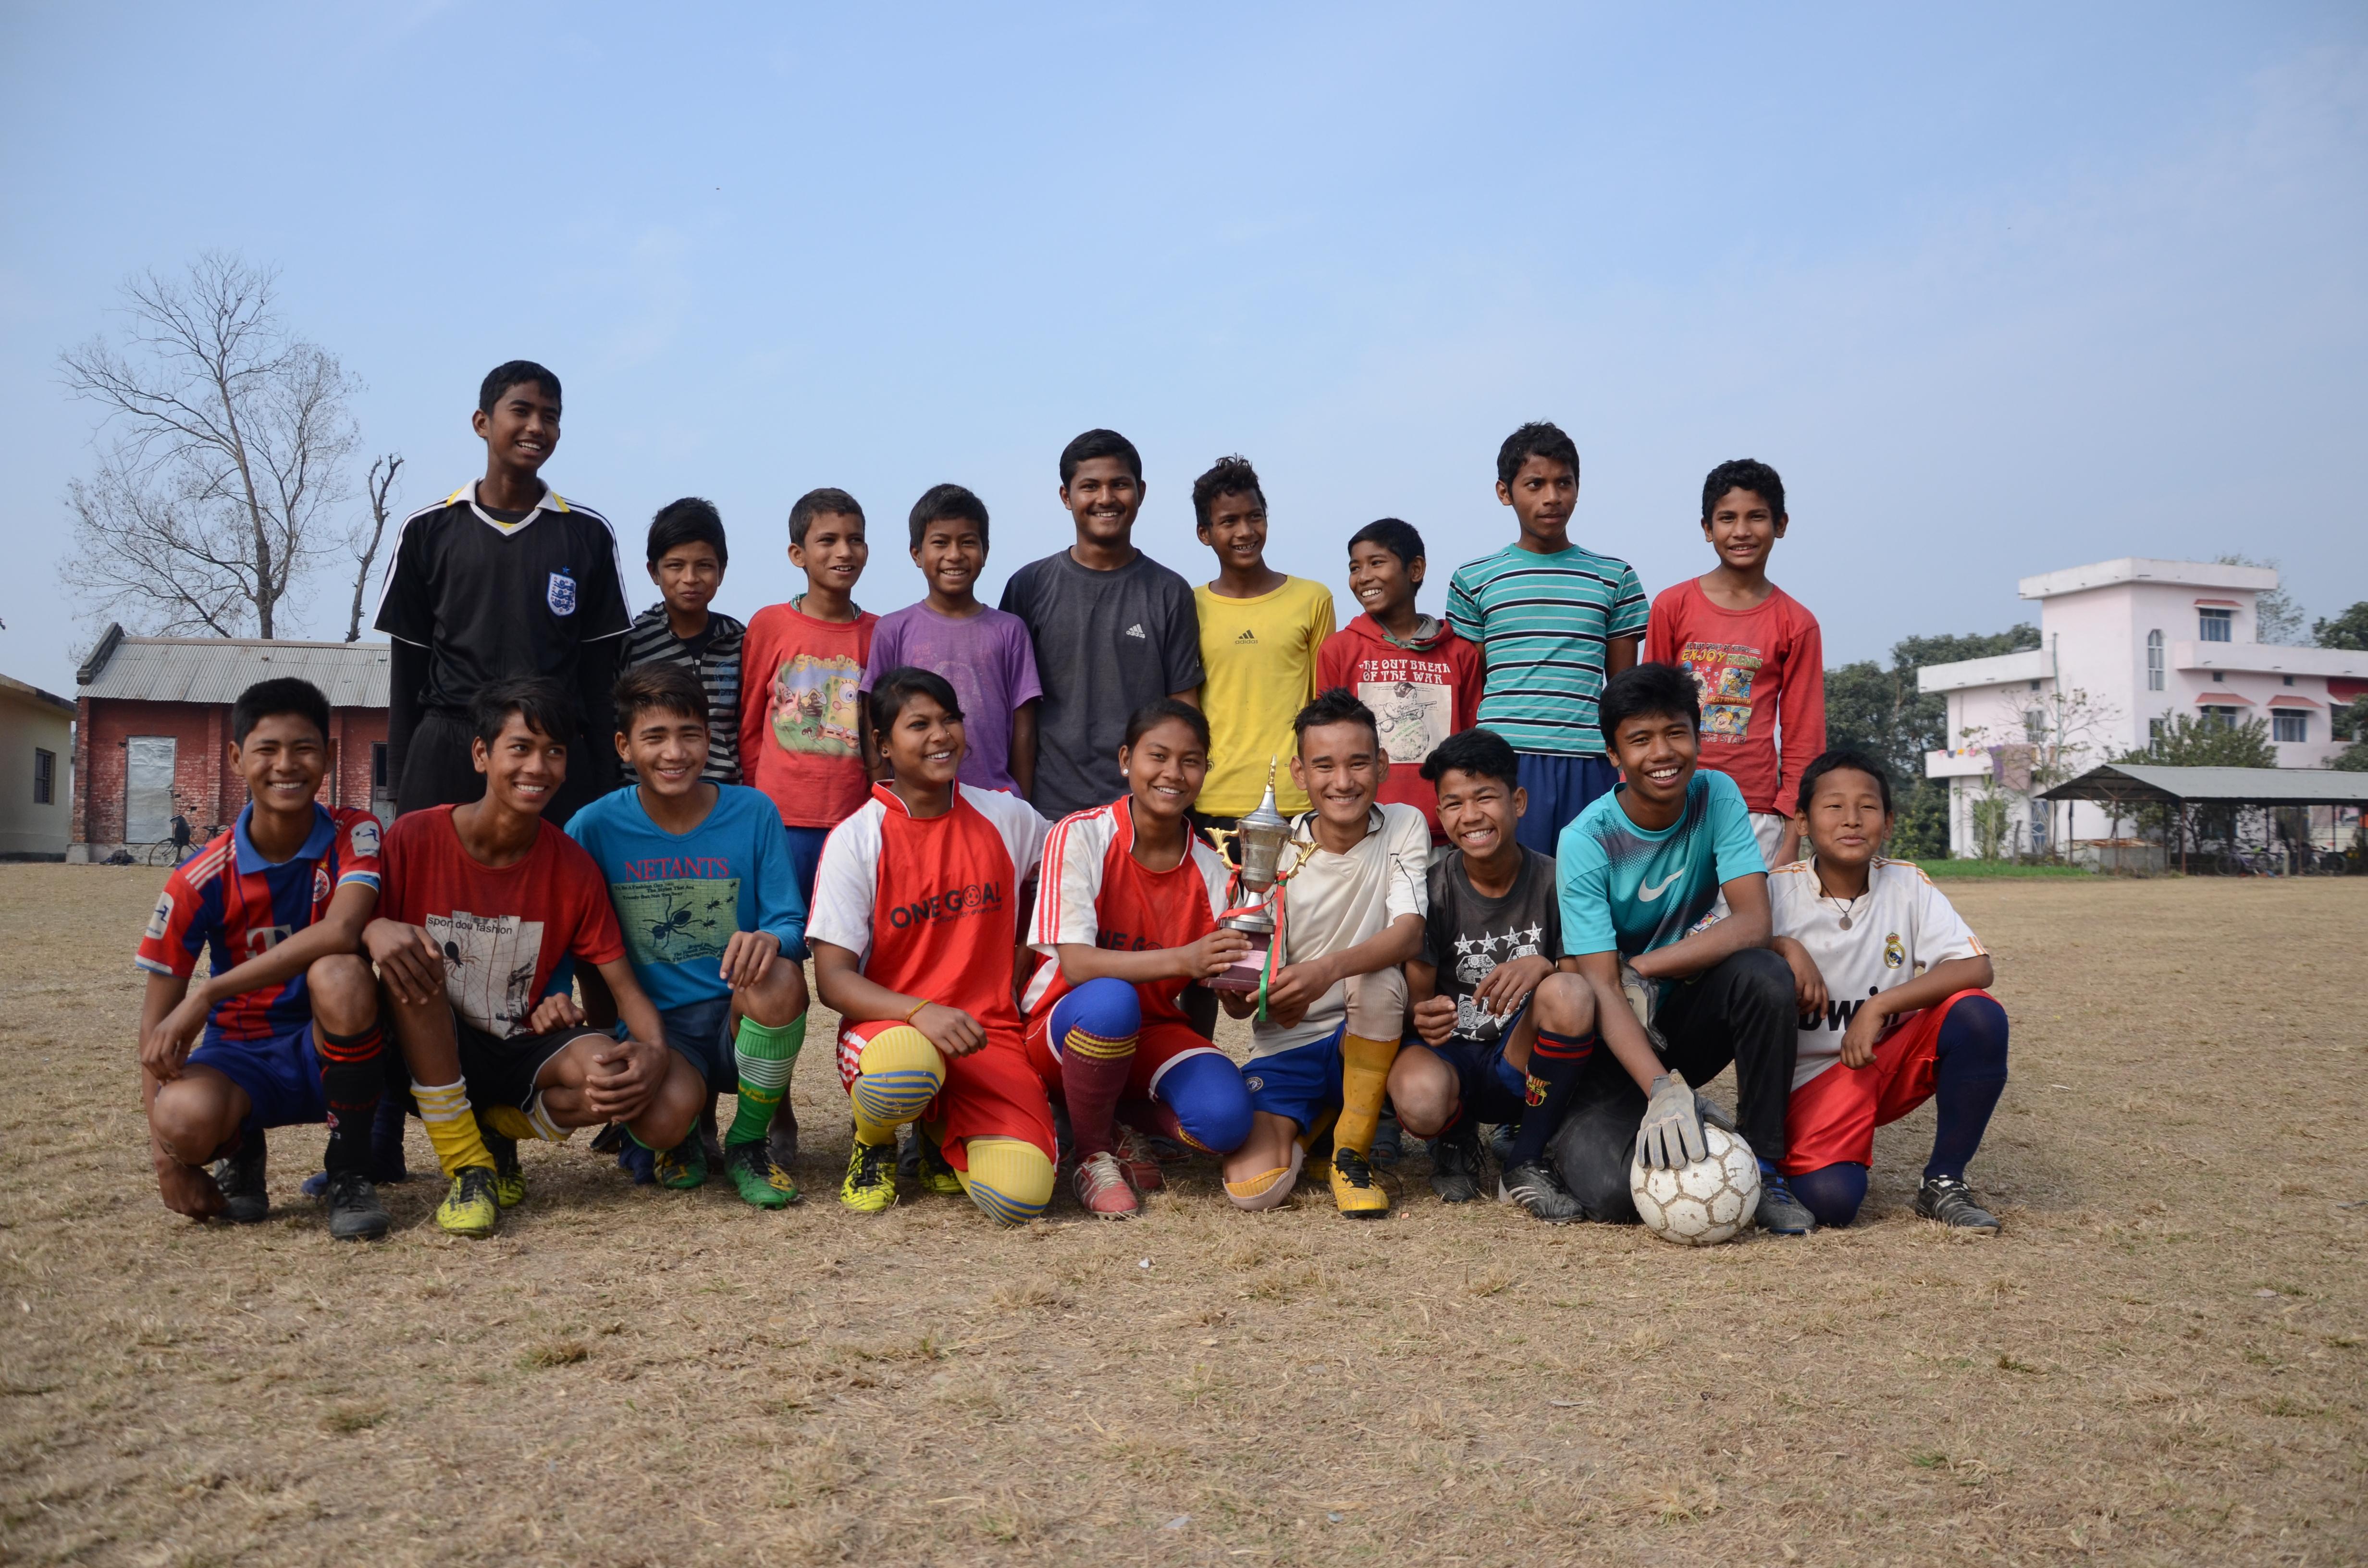 s151194-10-Sumina-Nepal-SKunwar_(29)_720417.JPG